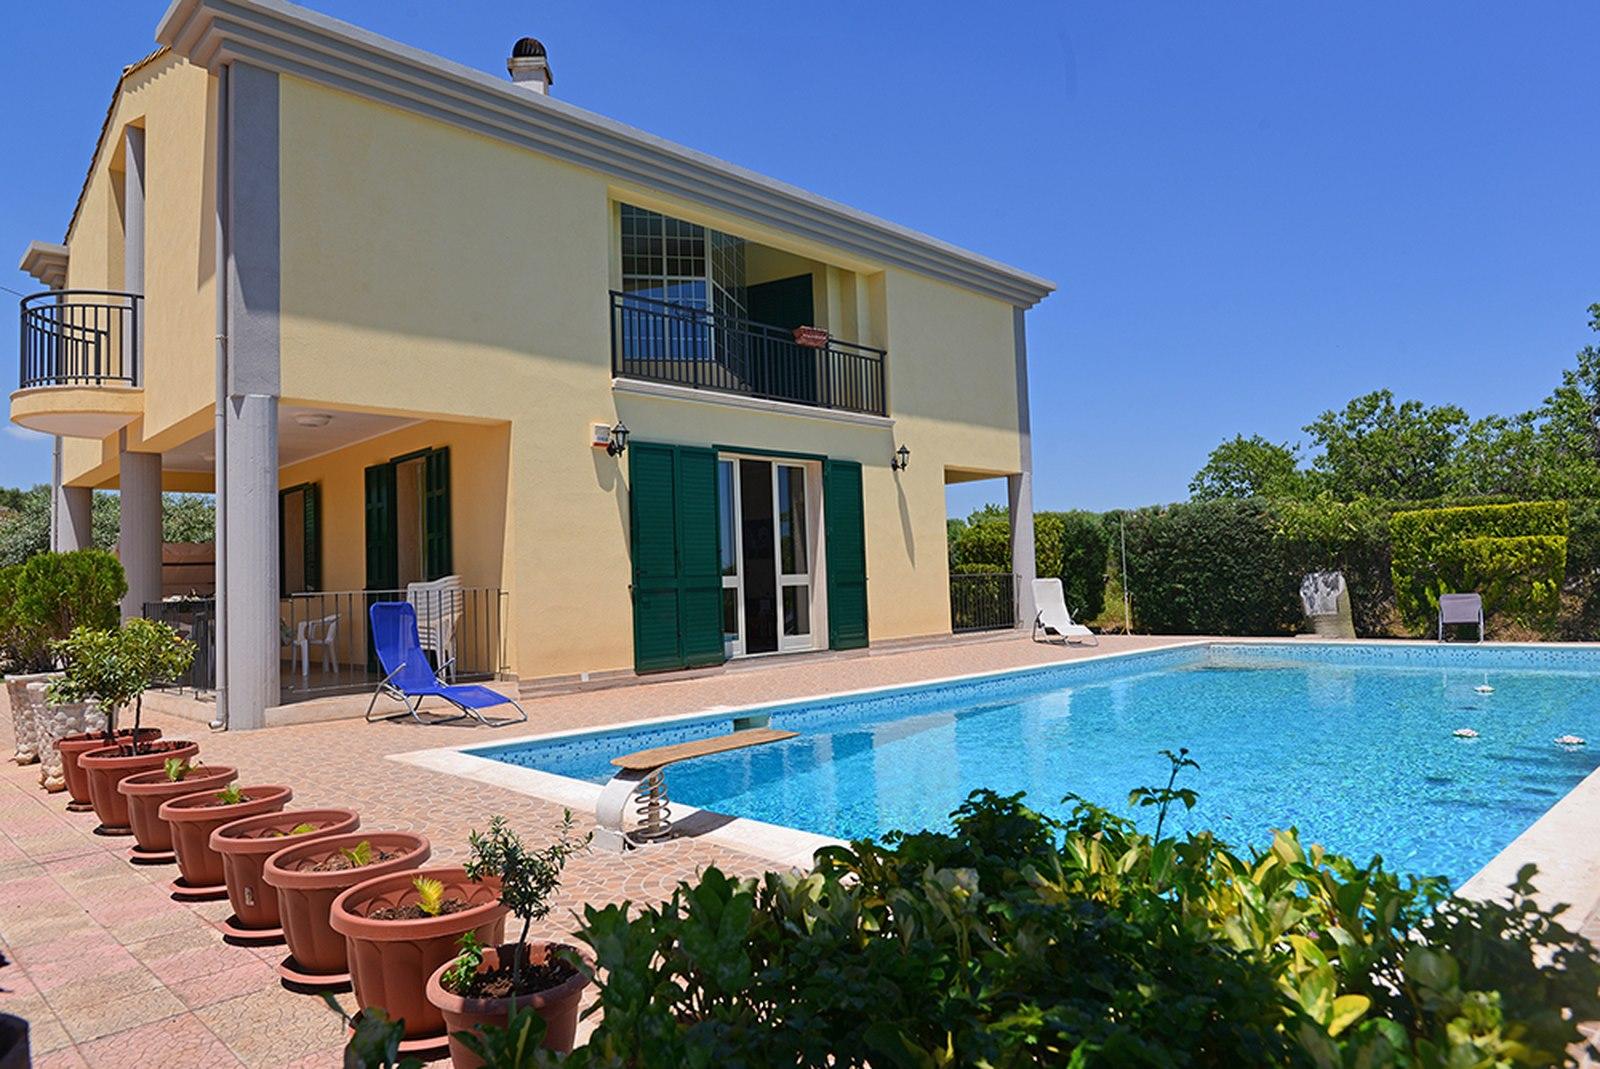 Maison de vacances Villa Paola (1041138), Floridia, Siracusa, Sicile, Italie, image 20